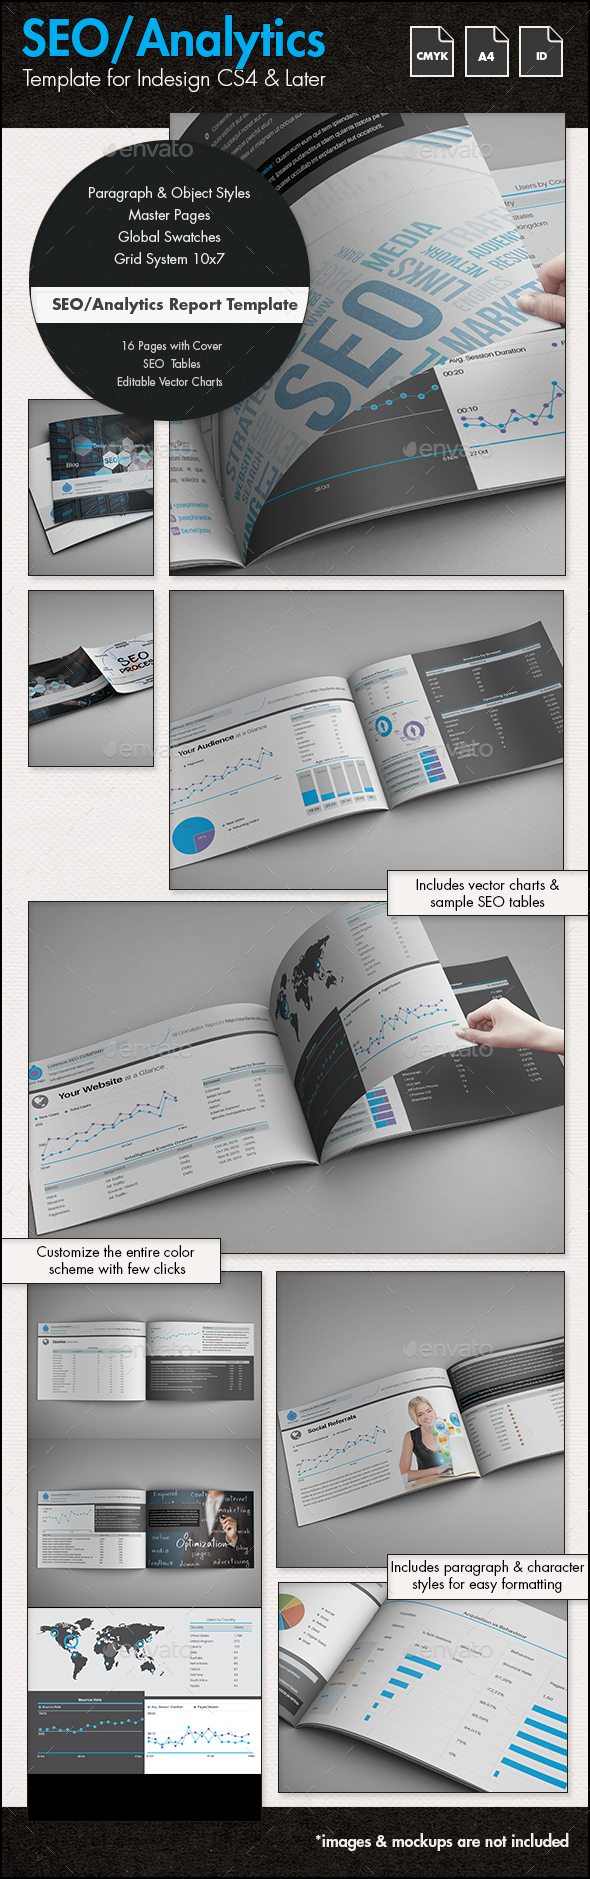 Google Analytics Report Graphics, Designs & Templates